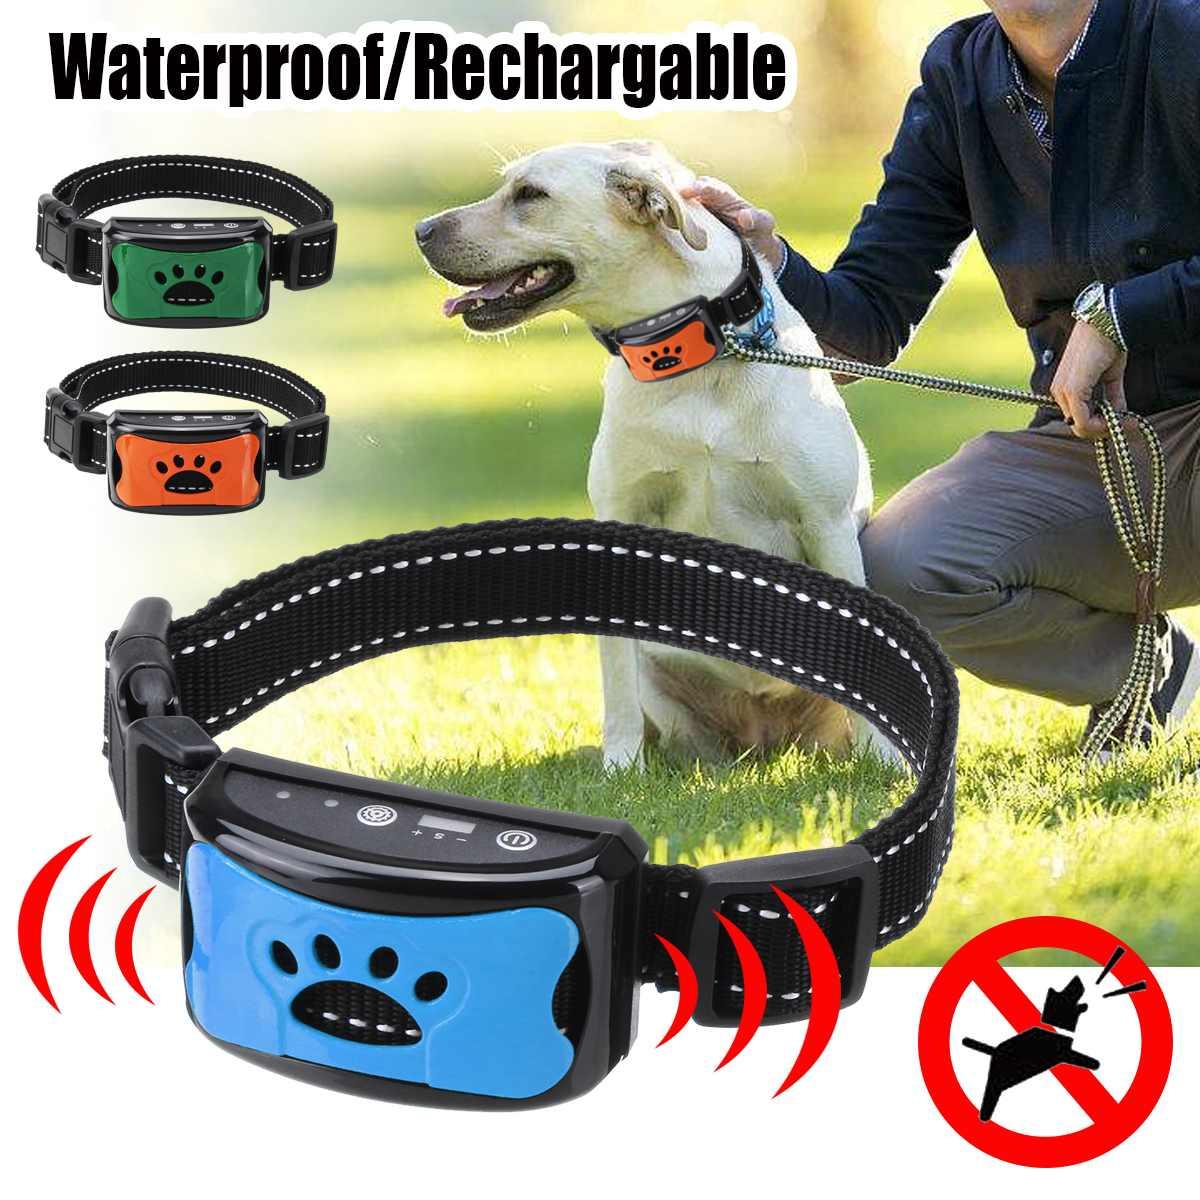 Pet Dog Rechargeable Anti Bark Collar Control Train Waterproof Stop Barking Pet Dog Waterproof Ultrasonic Training Collars